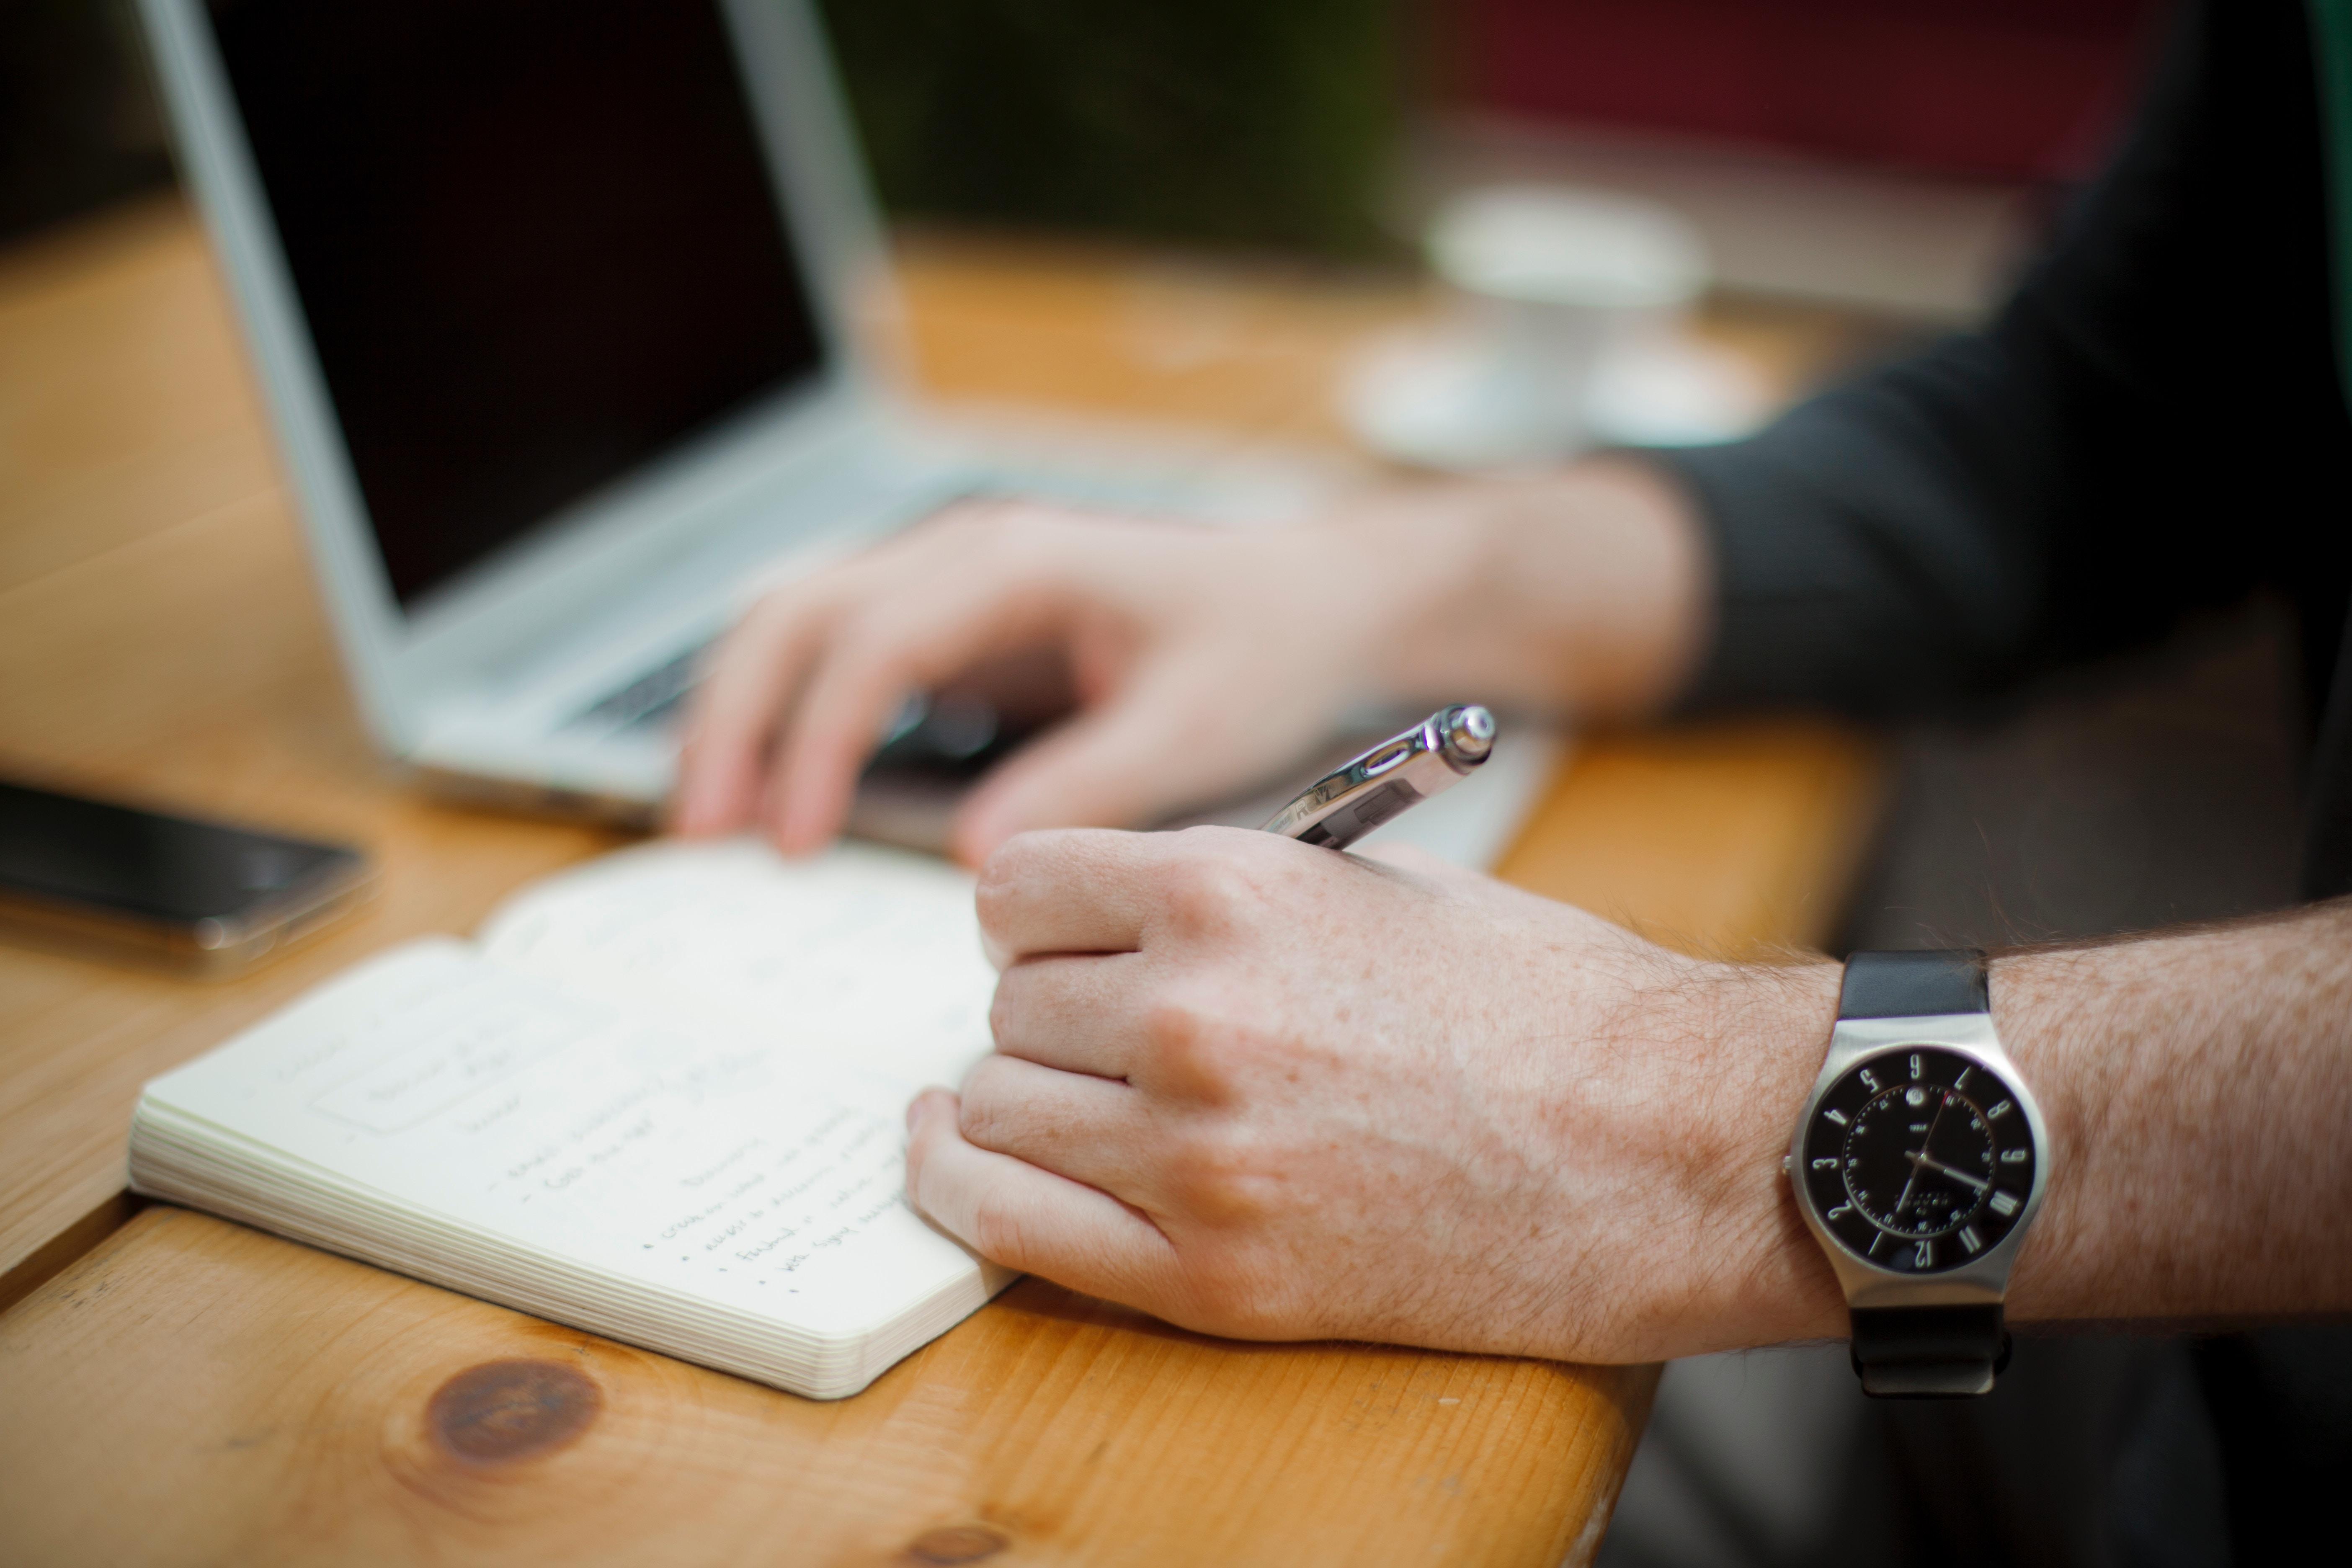 Manual and digital booking processes